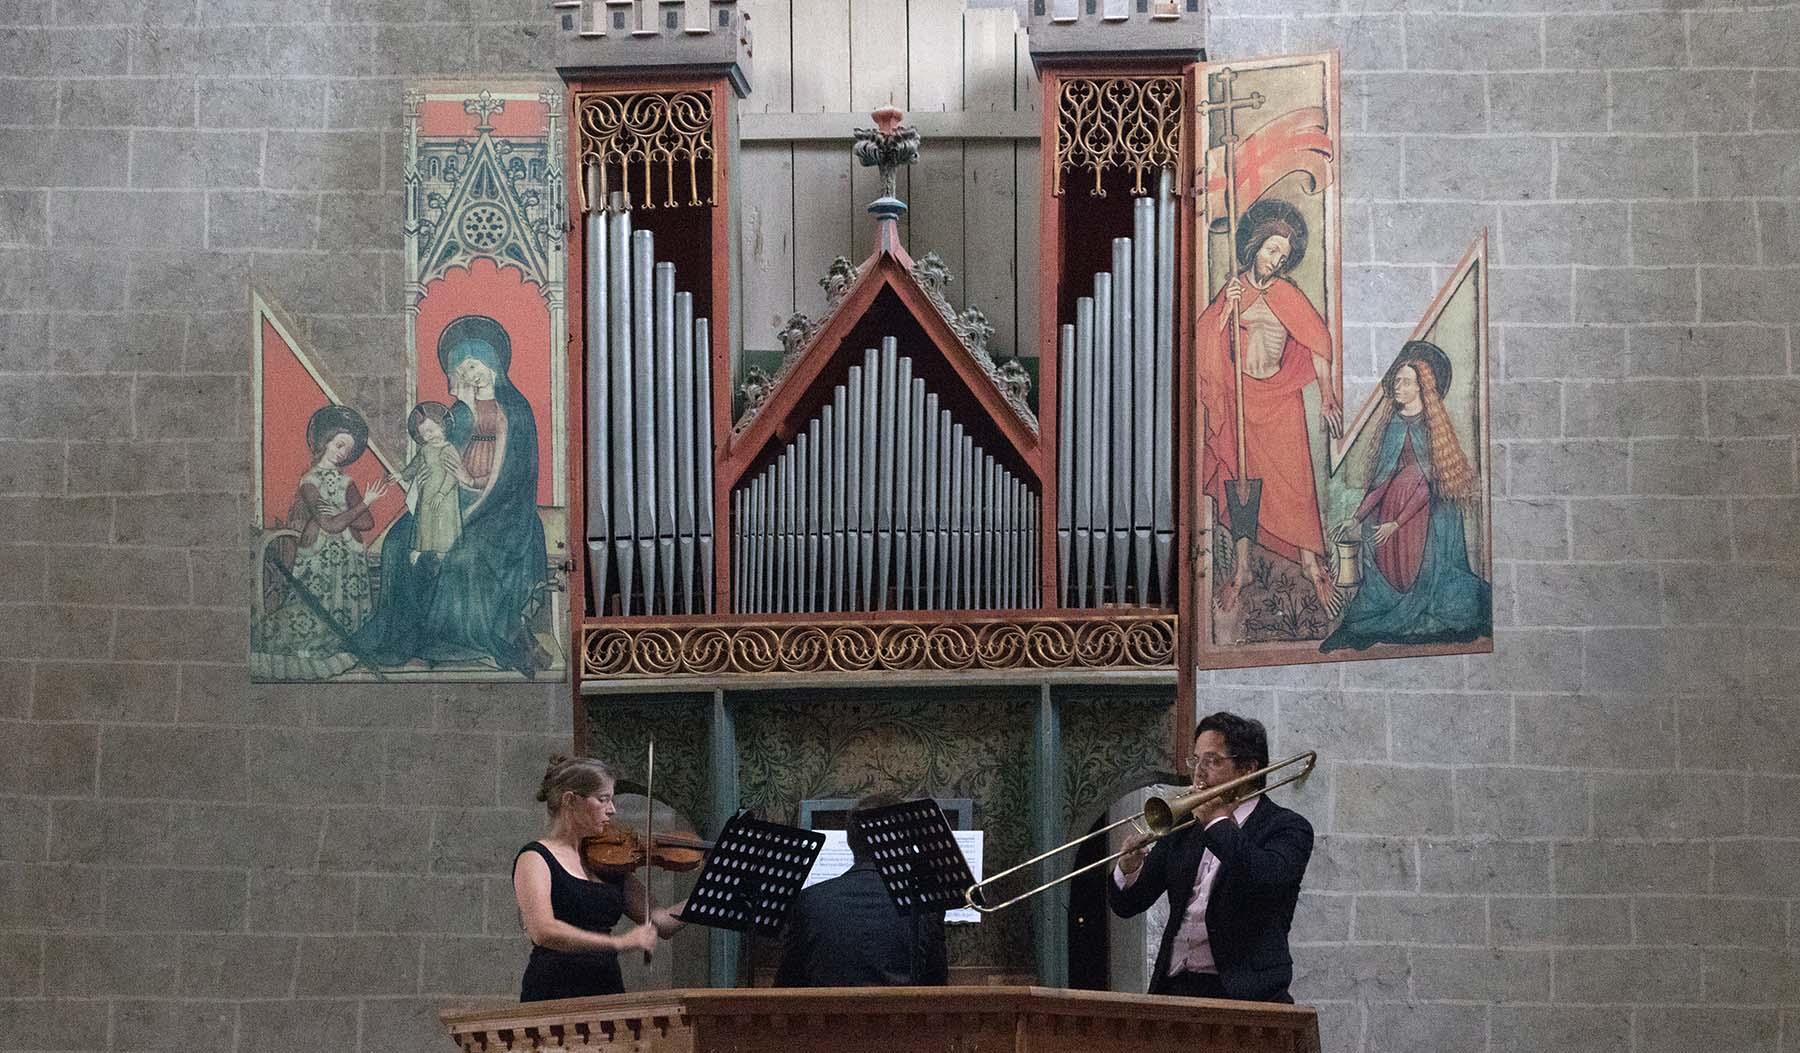 festival orgue ancien